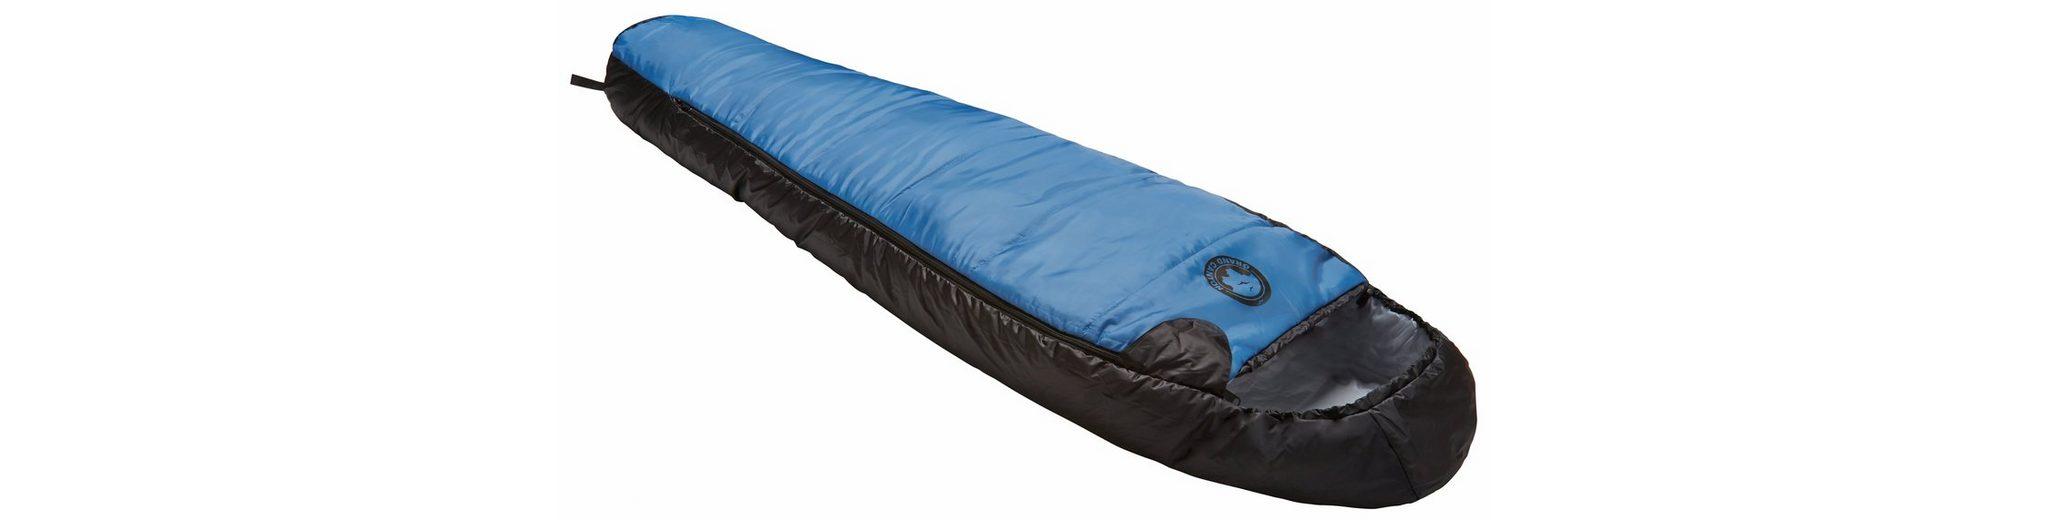 Grand Canyon Schlafsack »Cuddle Bag 150 Sleeping Bag for Kids«